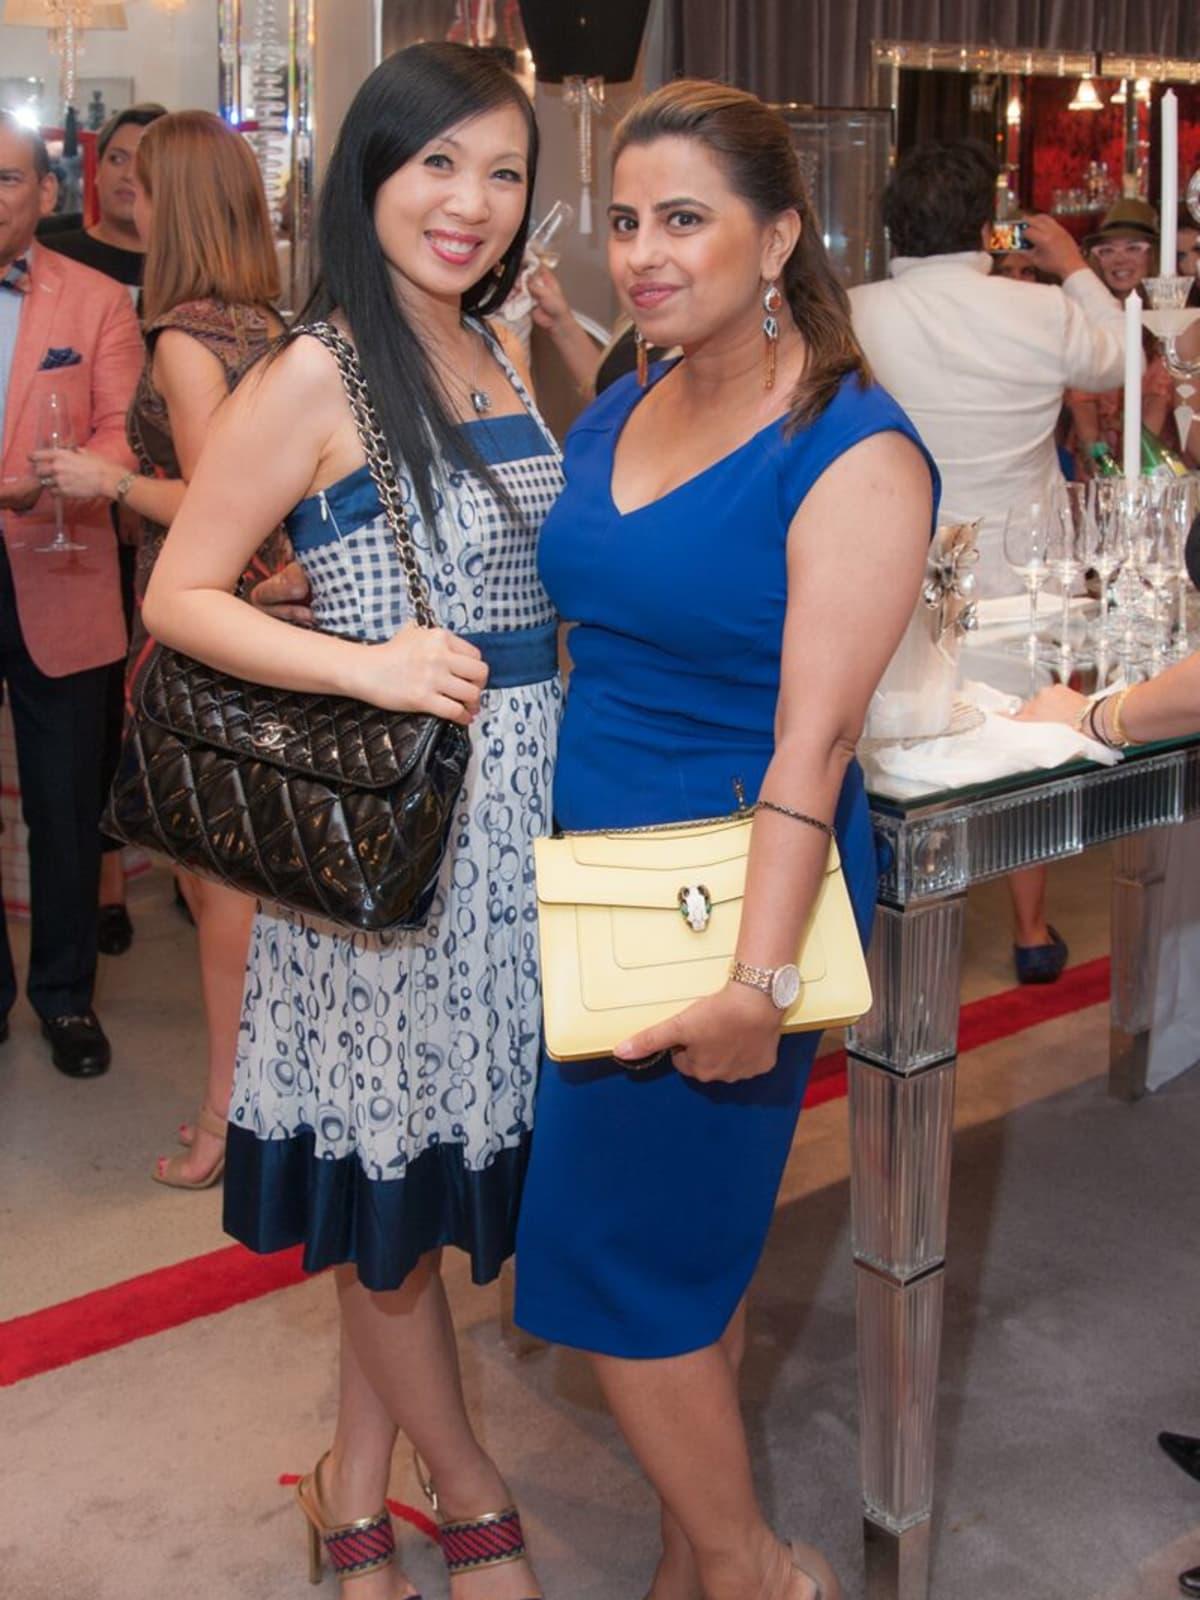 News, Shelby, Alex Martinez Back to School event, Aug. 2015, Connie Kwan-Wong, Ruchi Mukherjee